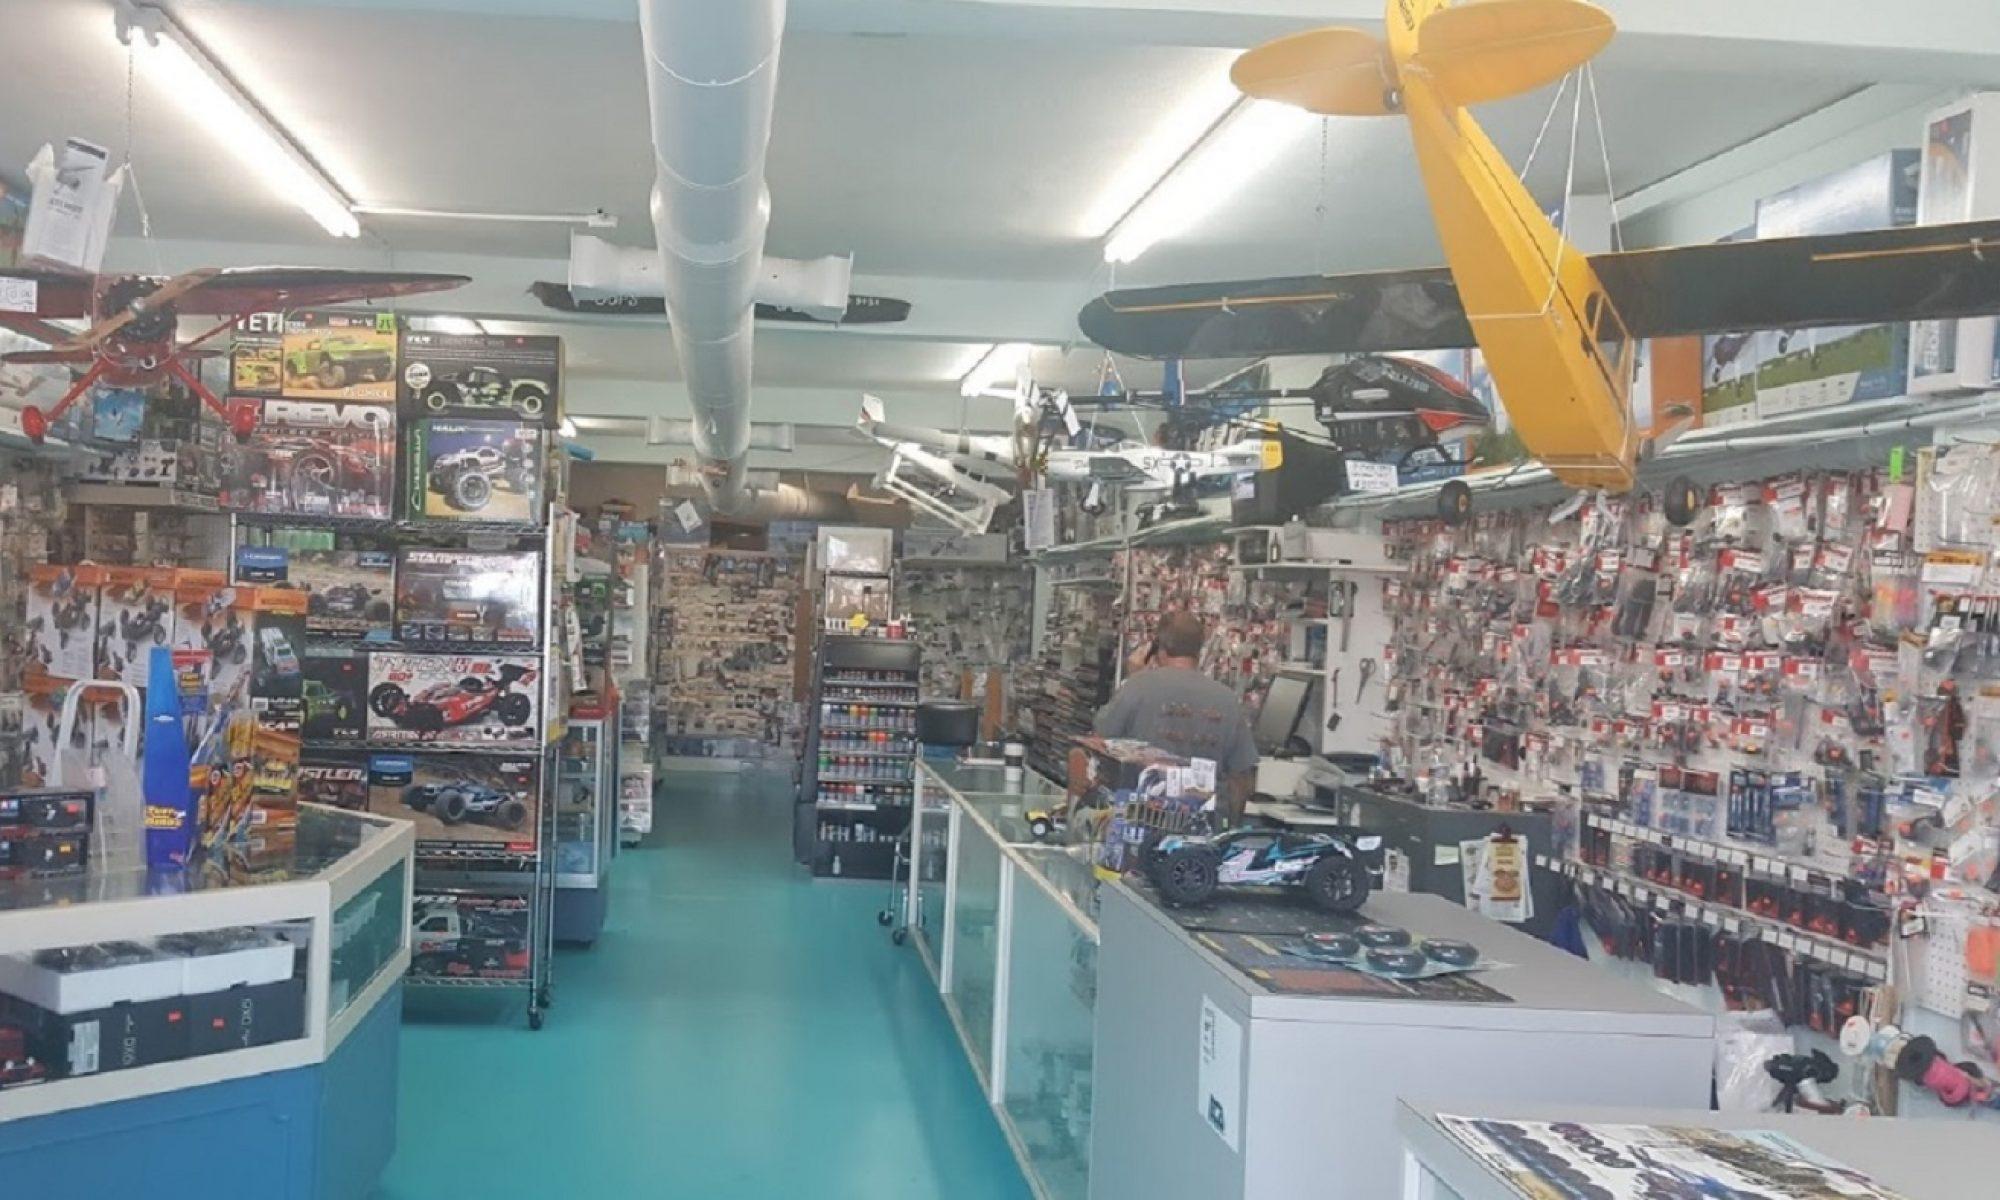 Ed's Hobby Shop